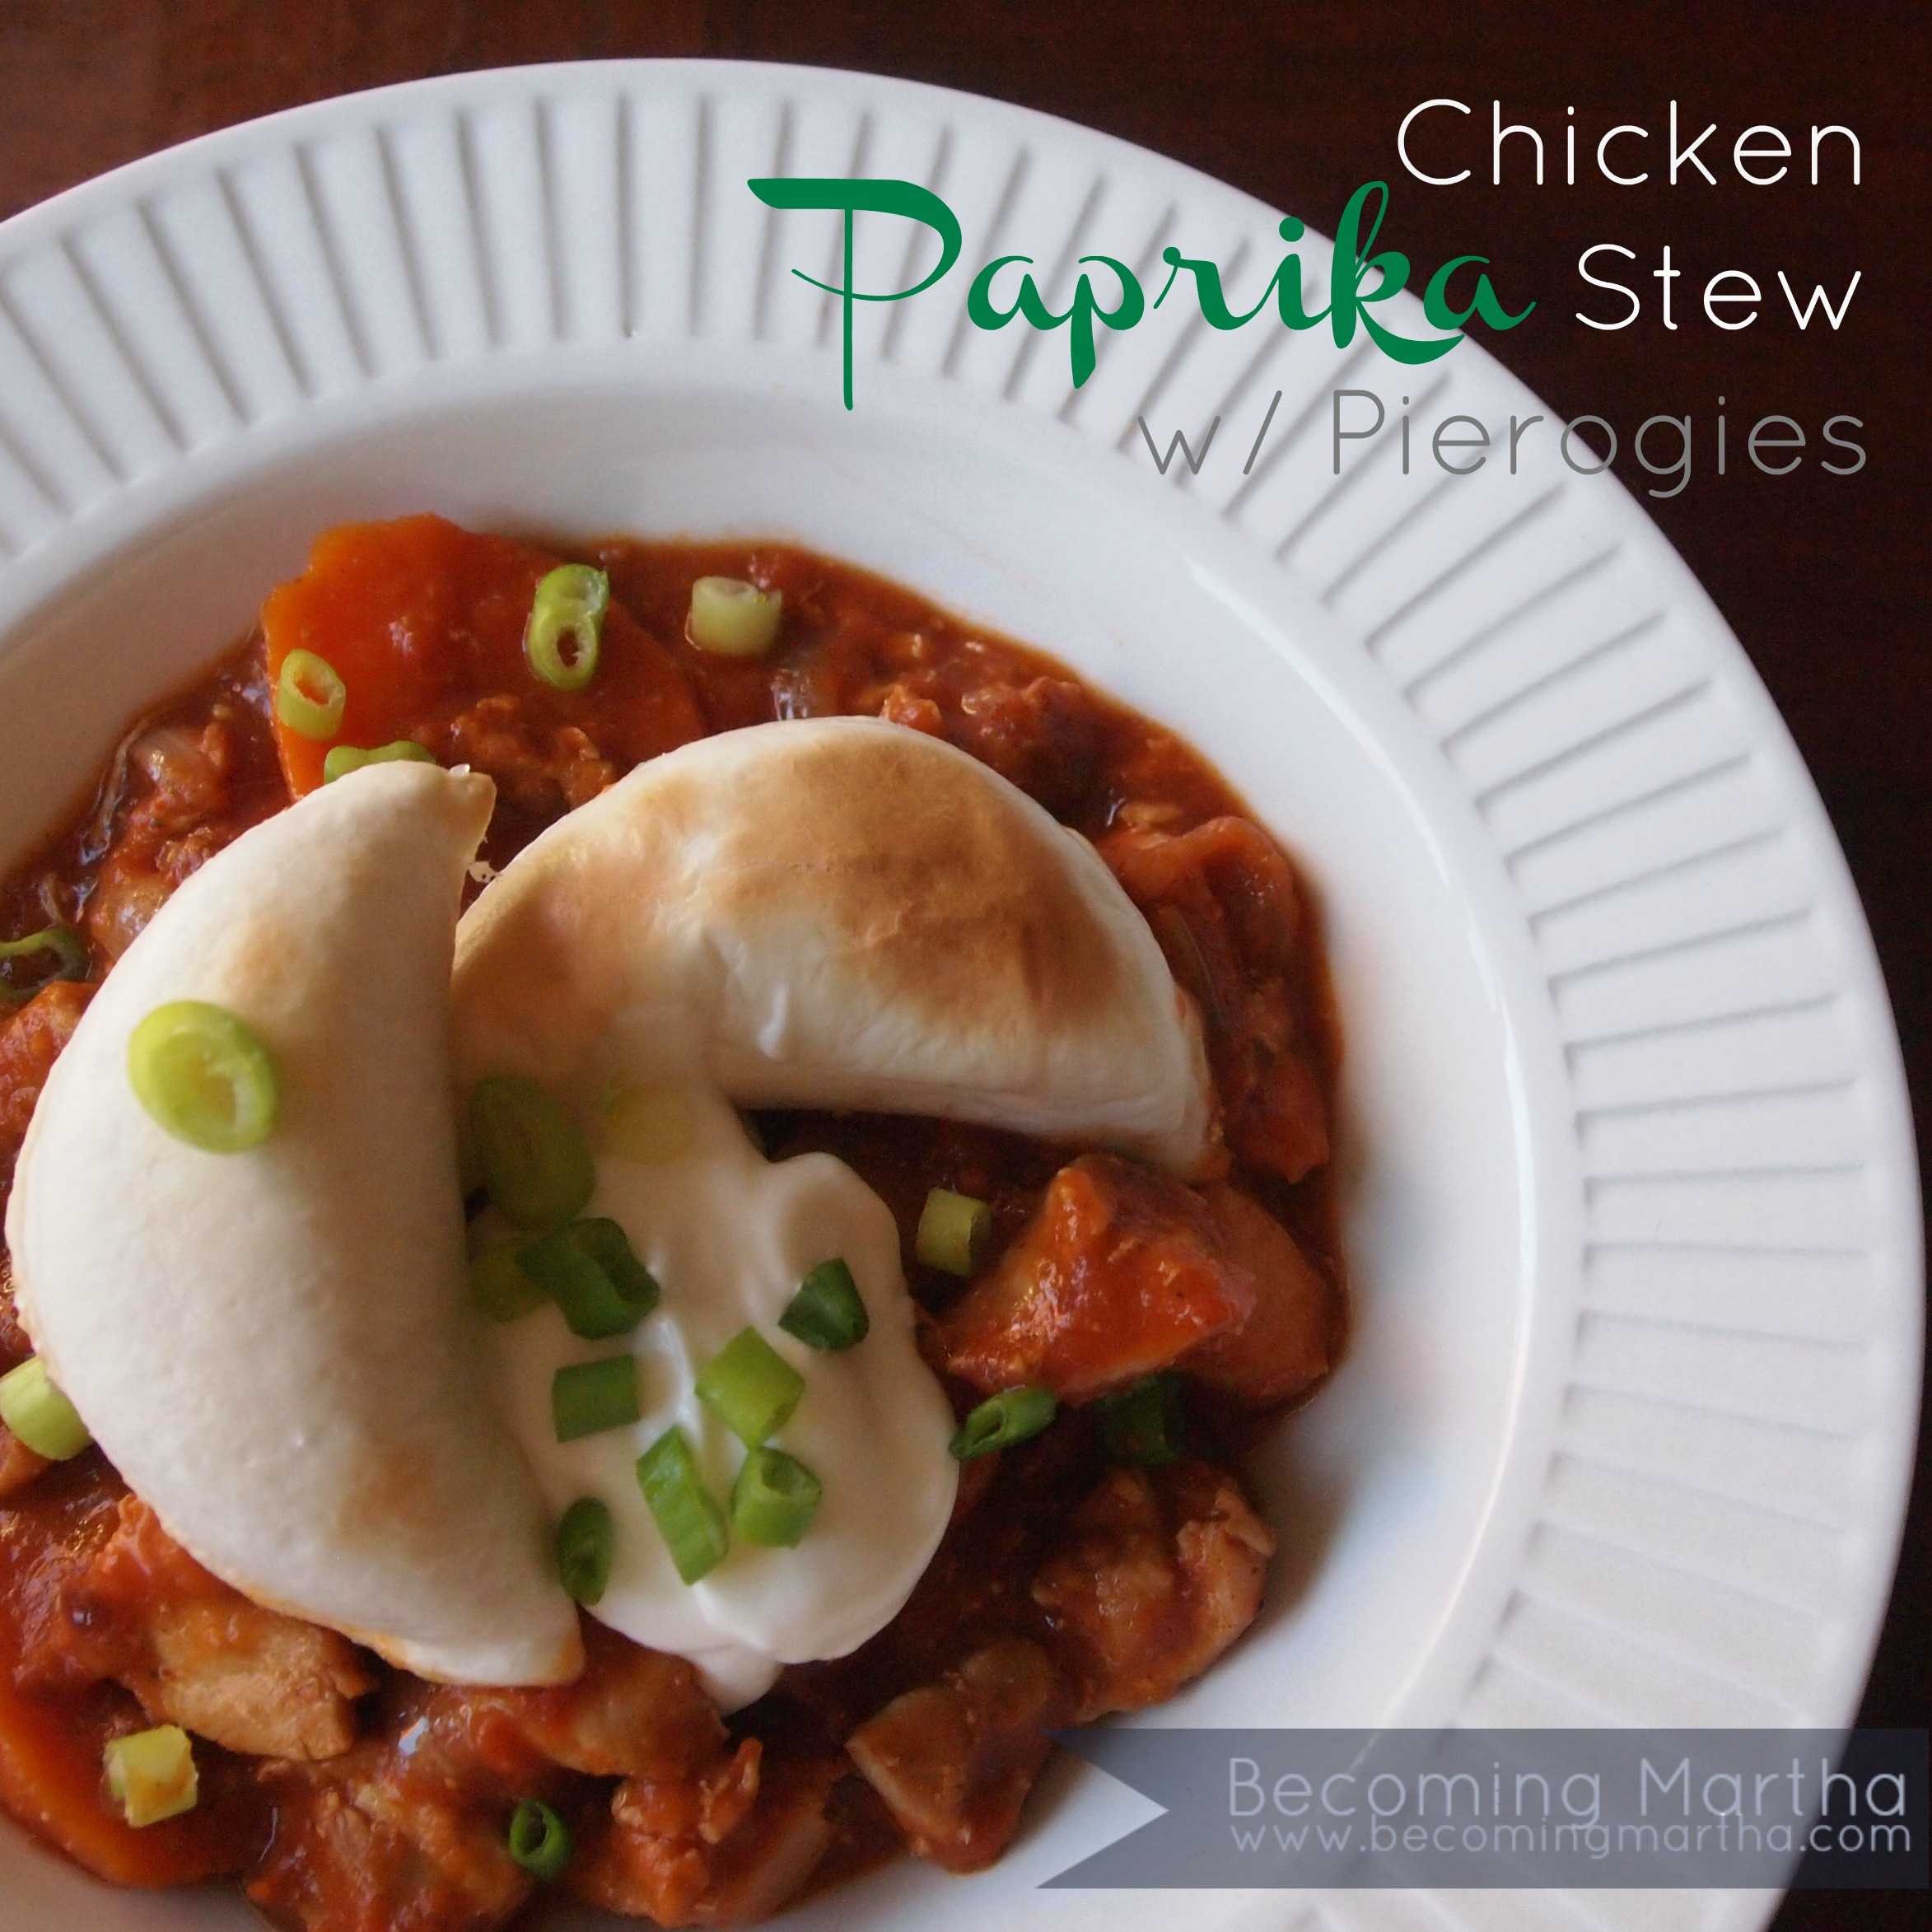 Chicken Paprika Stew with Pierogies